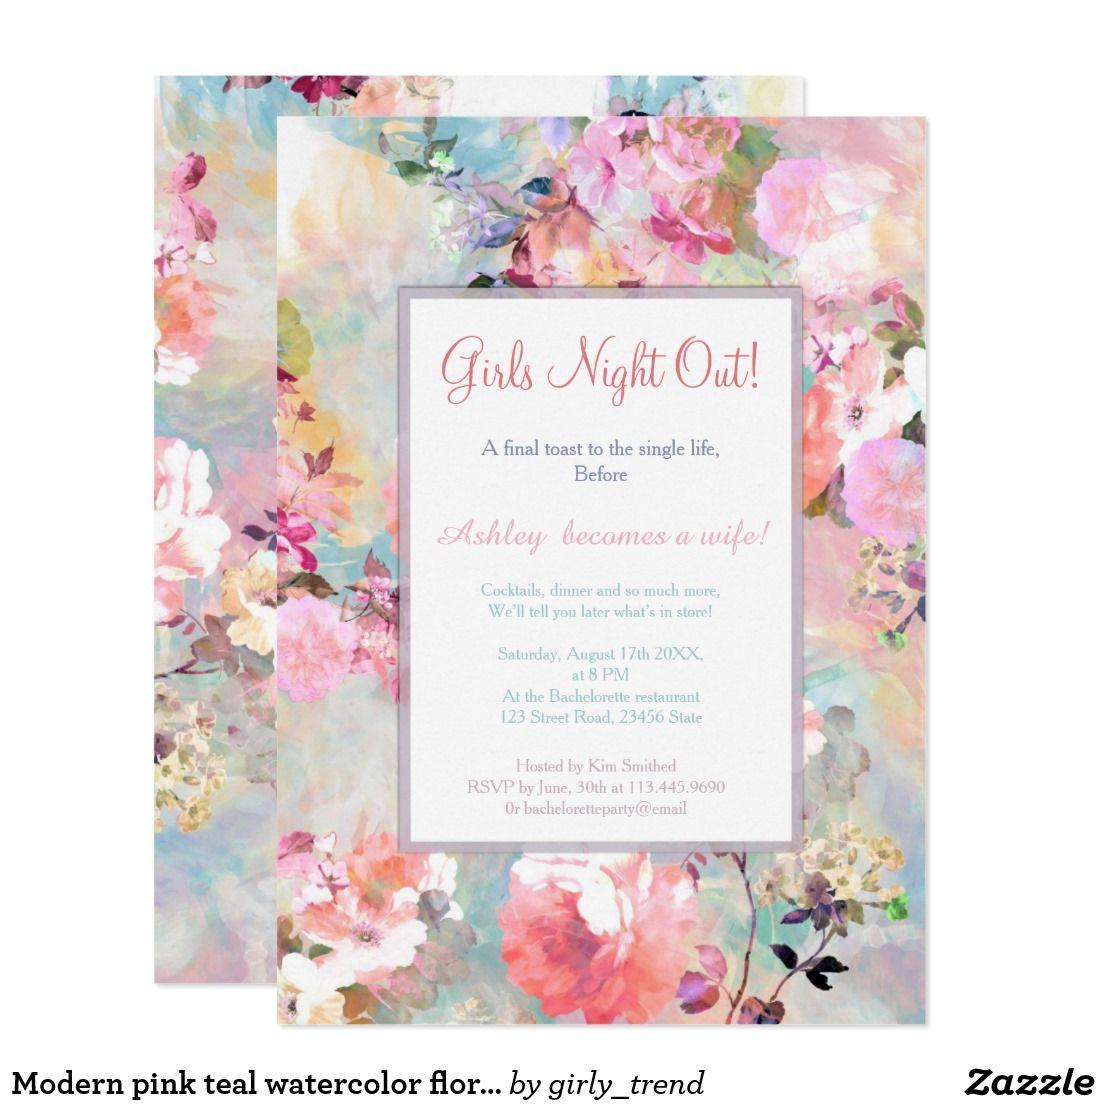 Modern pink teal watercolor floral bachelorette card | Bachelorette ...